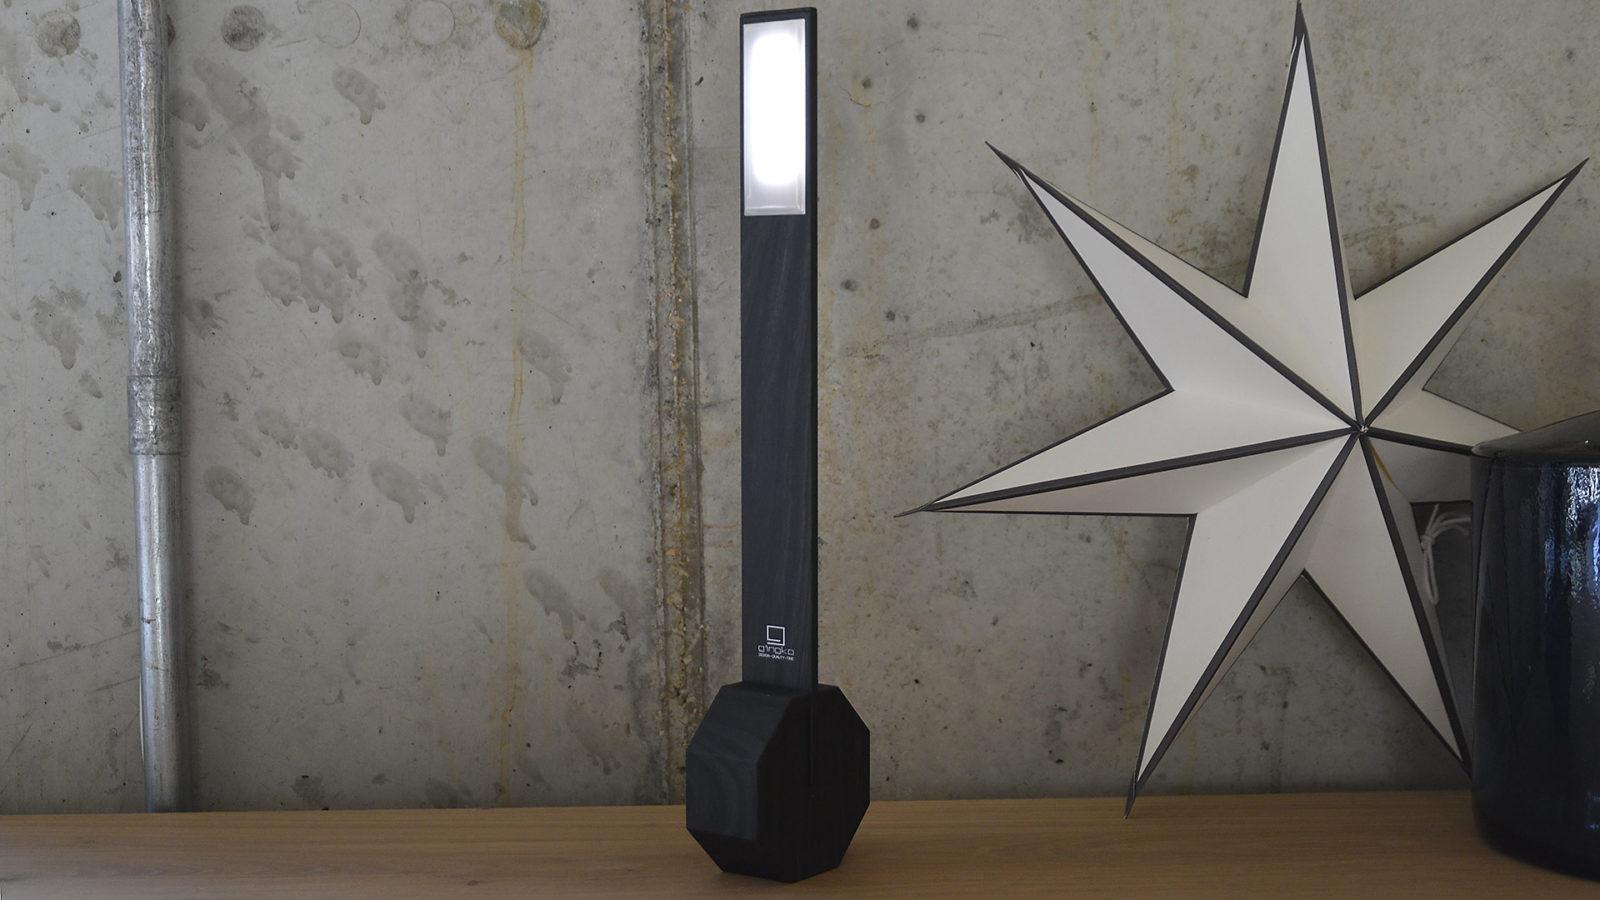 octagon-desk-lamp-upright